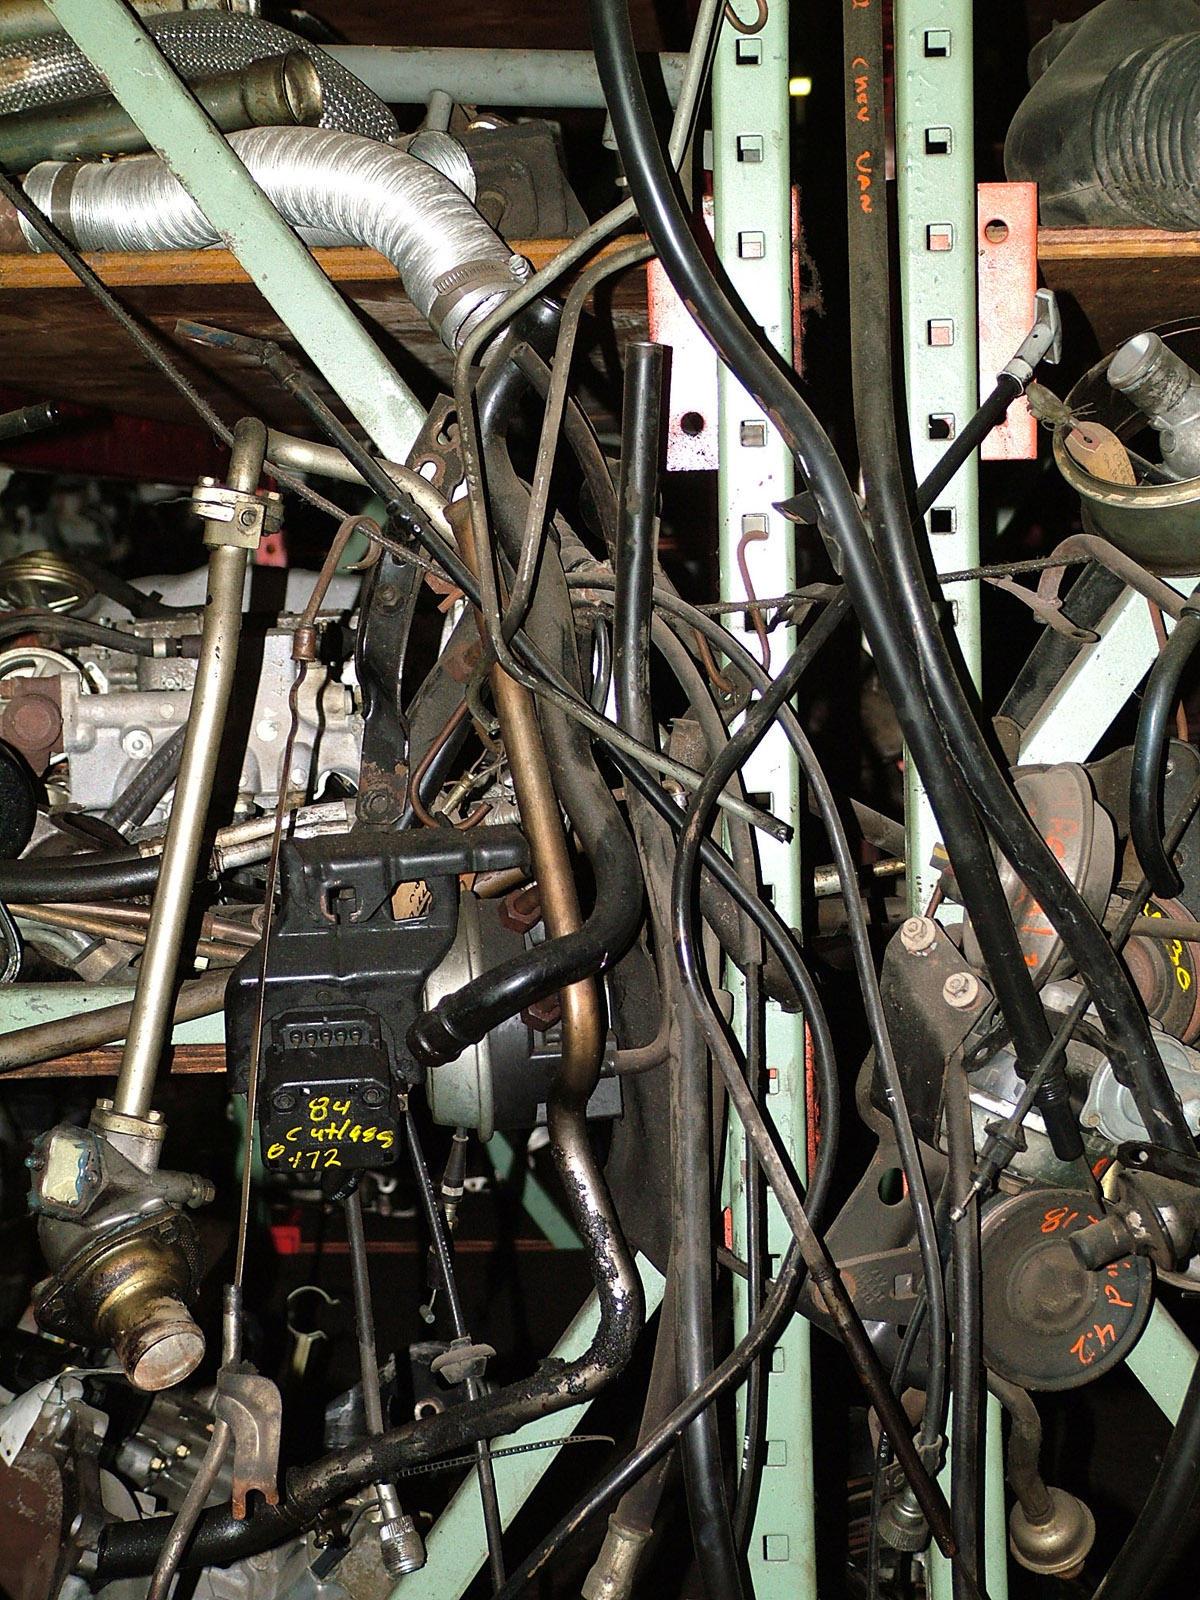 junk_yard___robot_intestines junk yard robot intestines by jensstockcollection on deviantart,Wiring A Robot